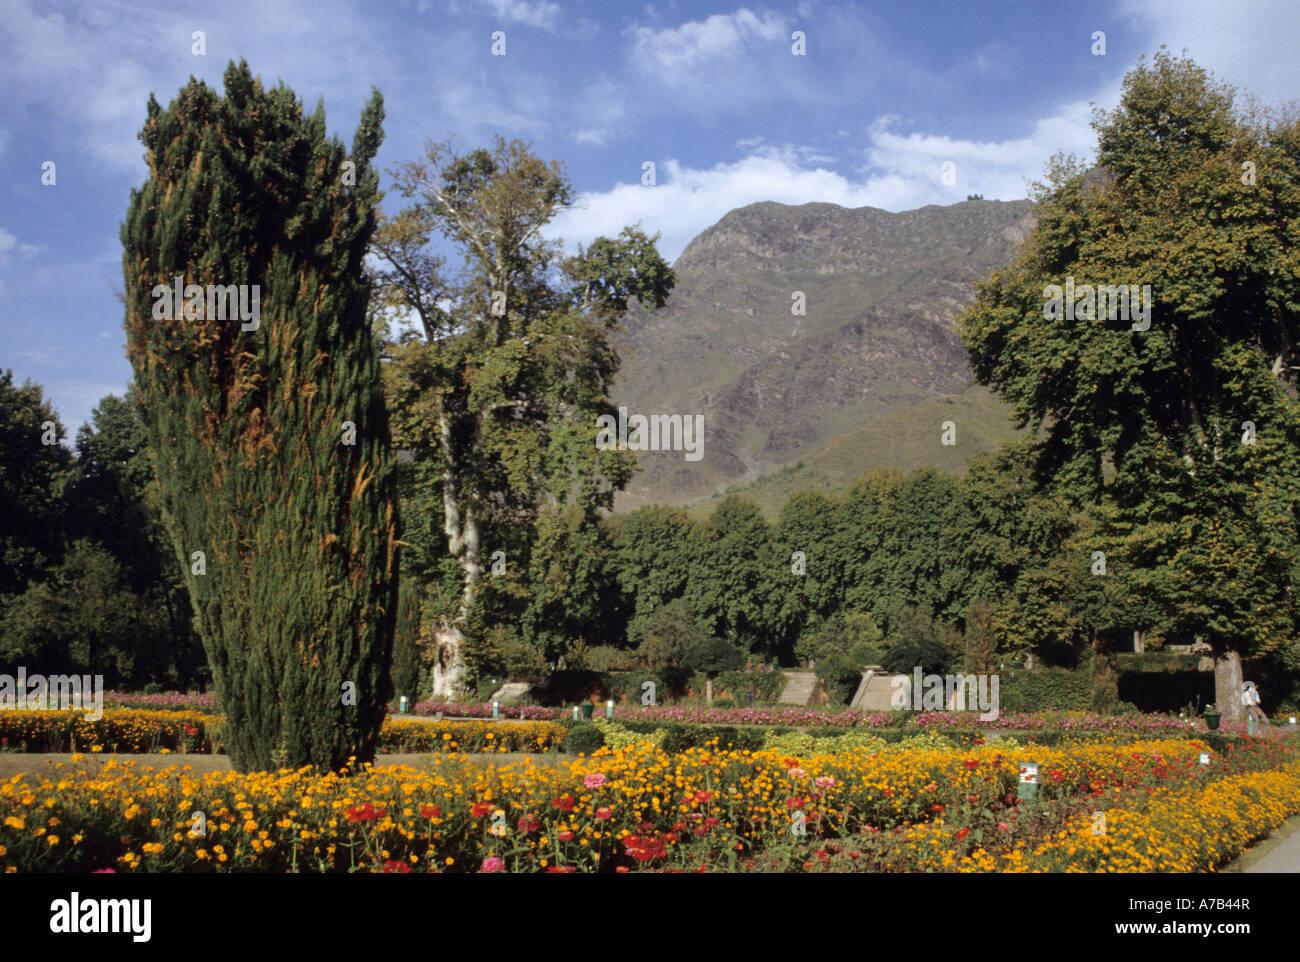 North India Local Caption Jammu Kashmir Srinigar Nishat Gardens ...